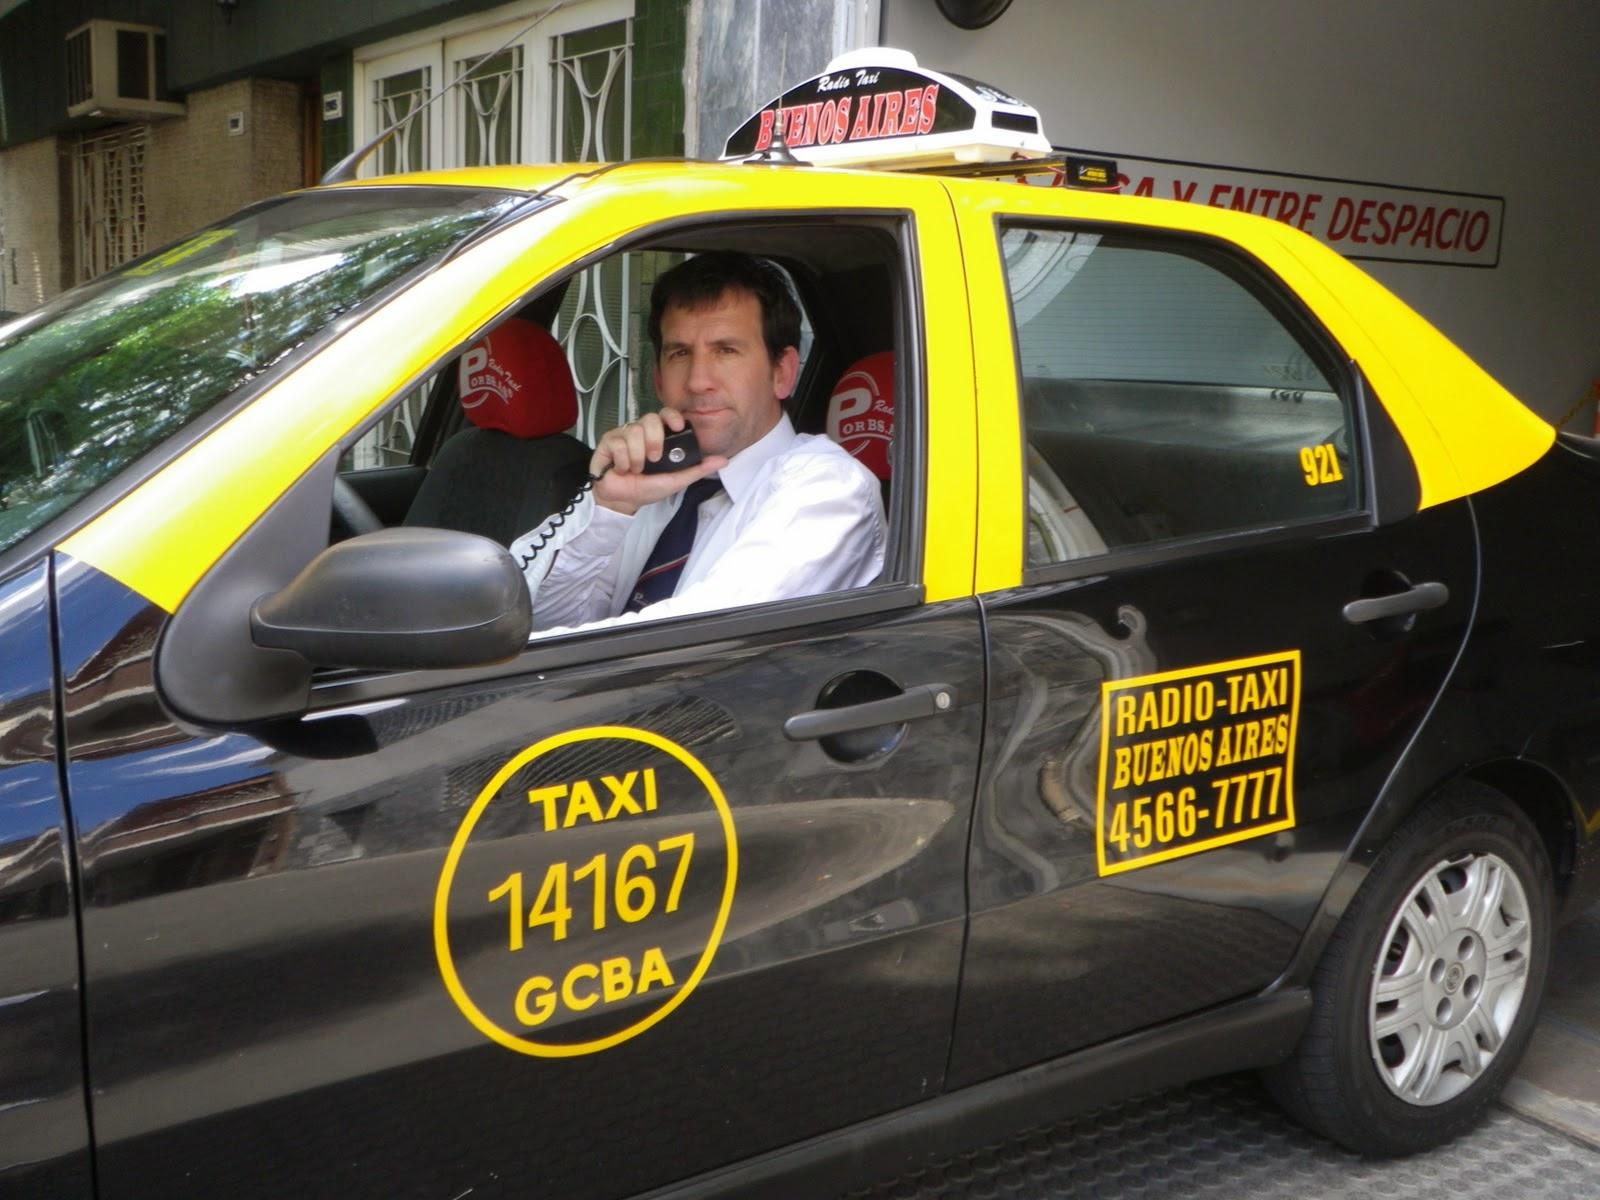 Taxista-milagroso.jpg